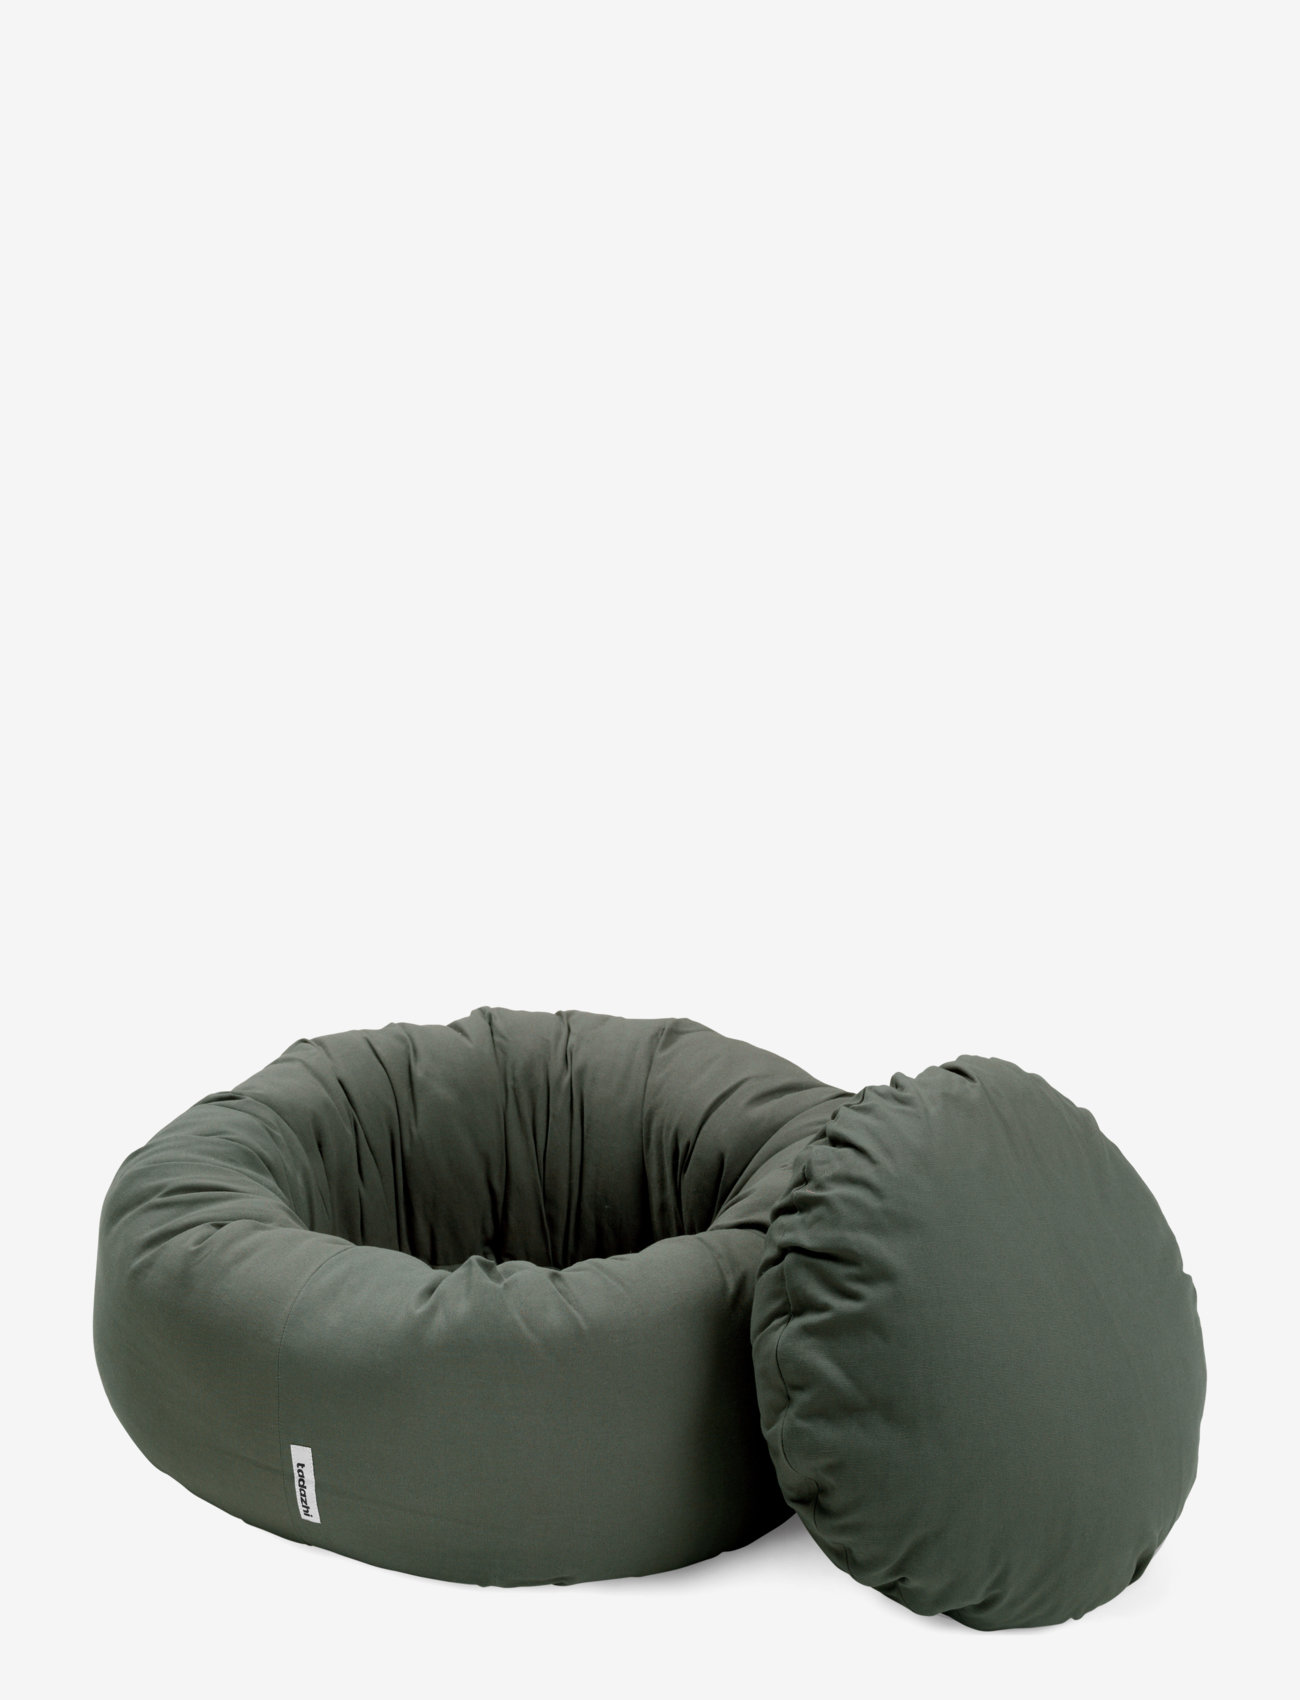 tadazhi - Donut bed - nyheder - pine green - 1